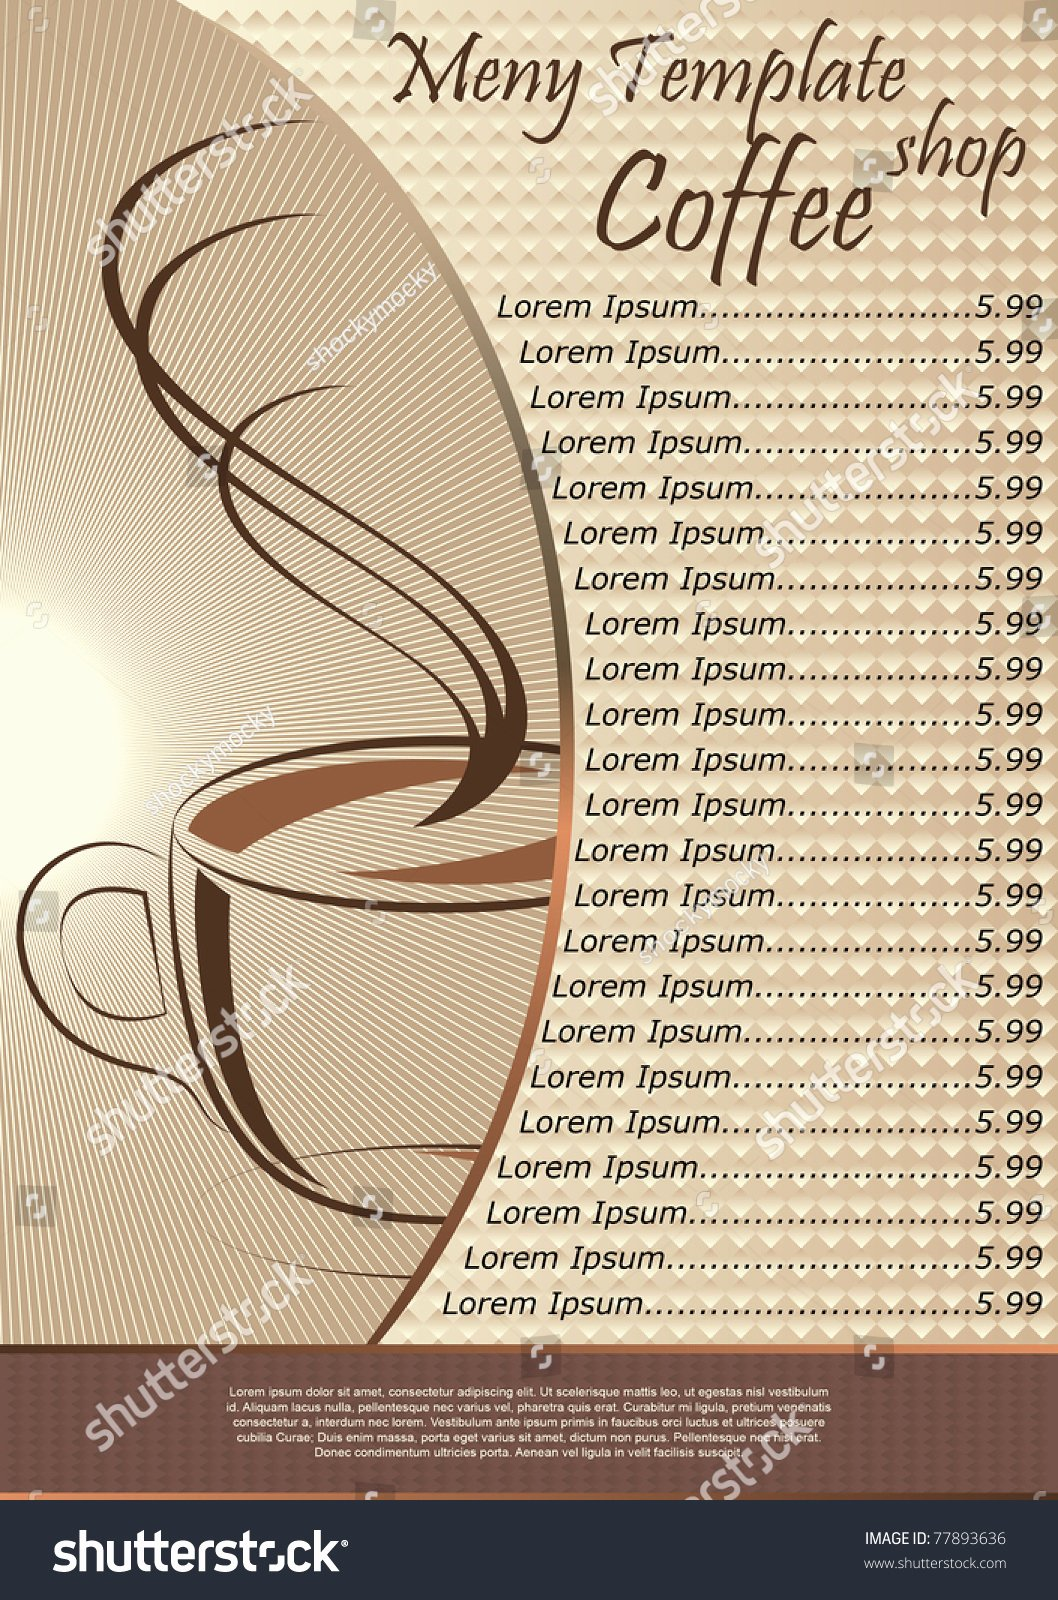 Coffee Shop Menu Template Beautiful Coffee Shop Menu Template Vector Illustration